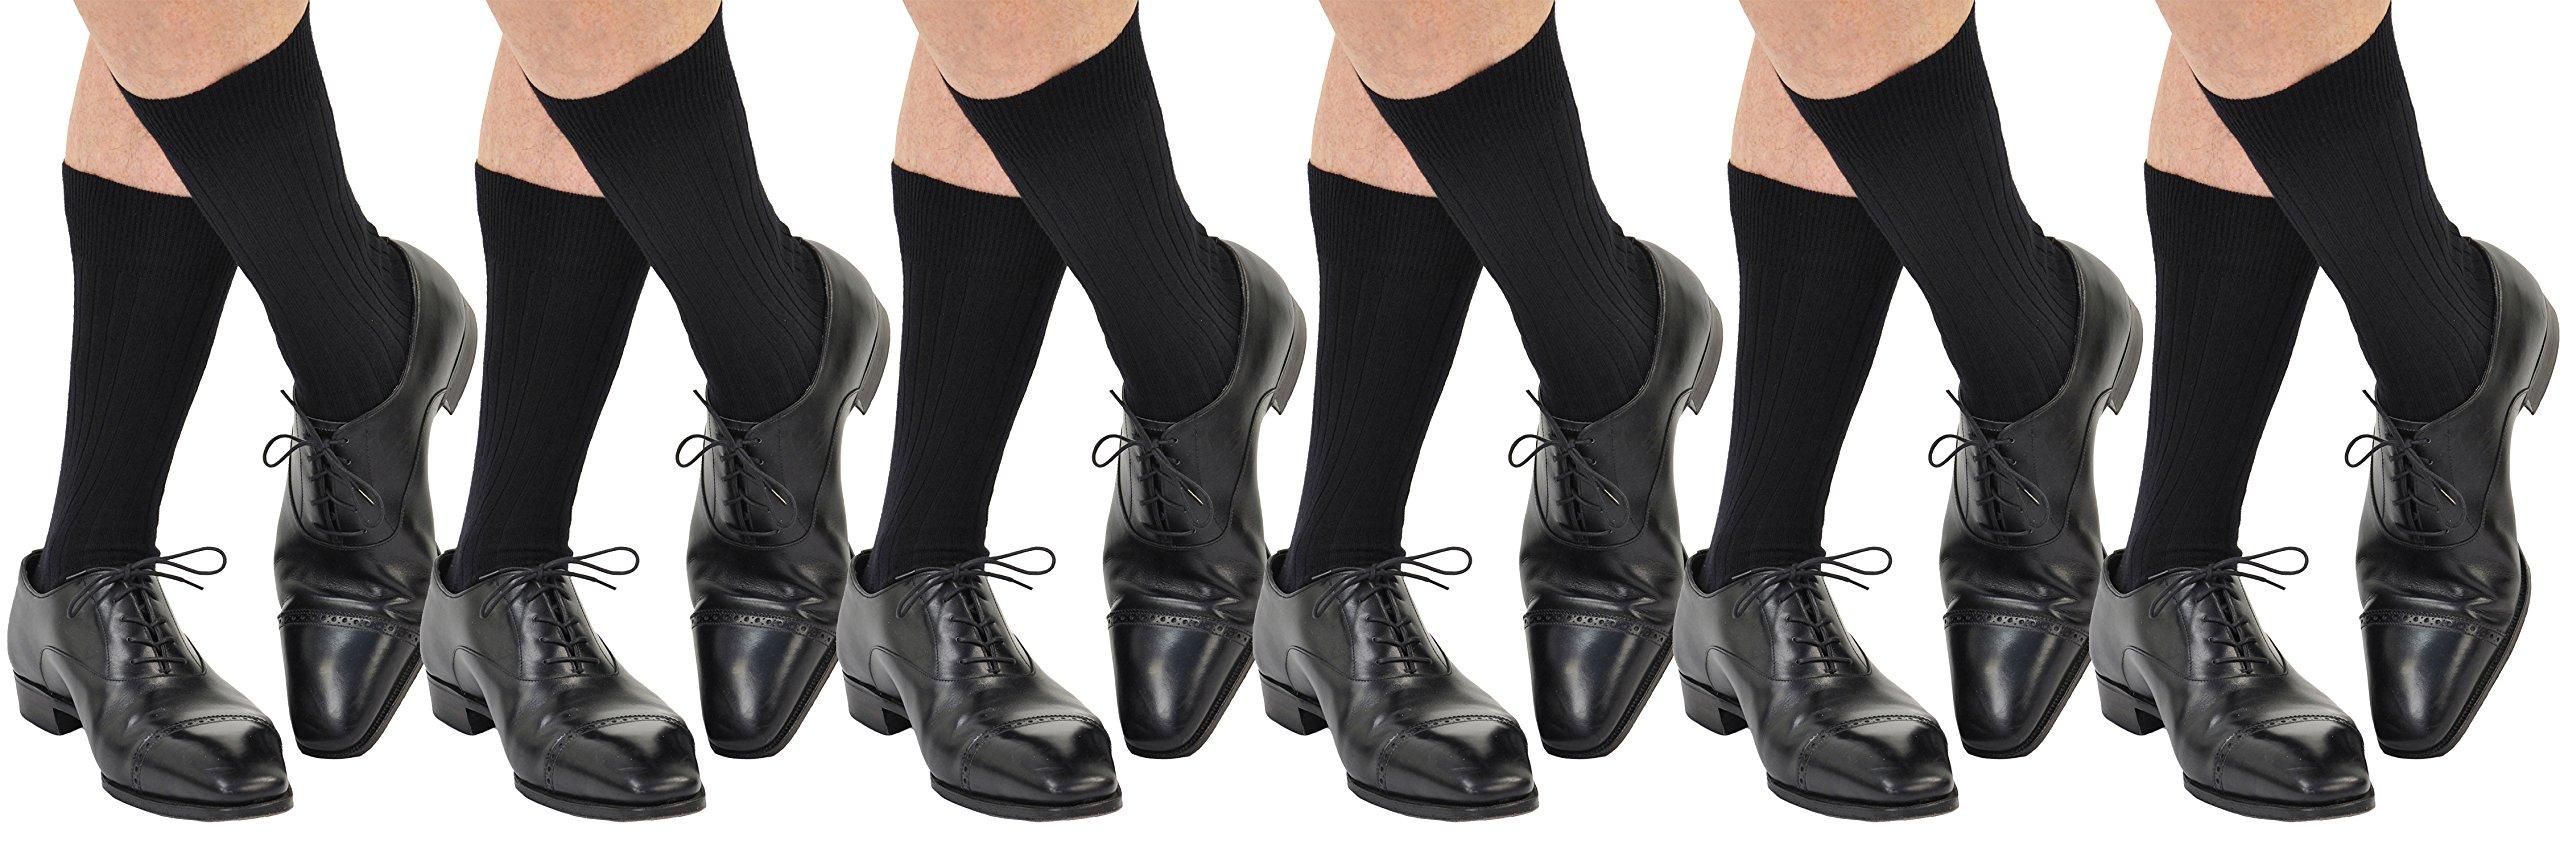 6 Pairs Men's ExtraFine Merino Marcoliani Mid-Calf Italian Dress Socks: 6 Black